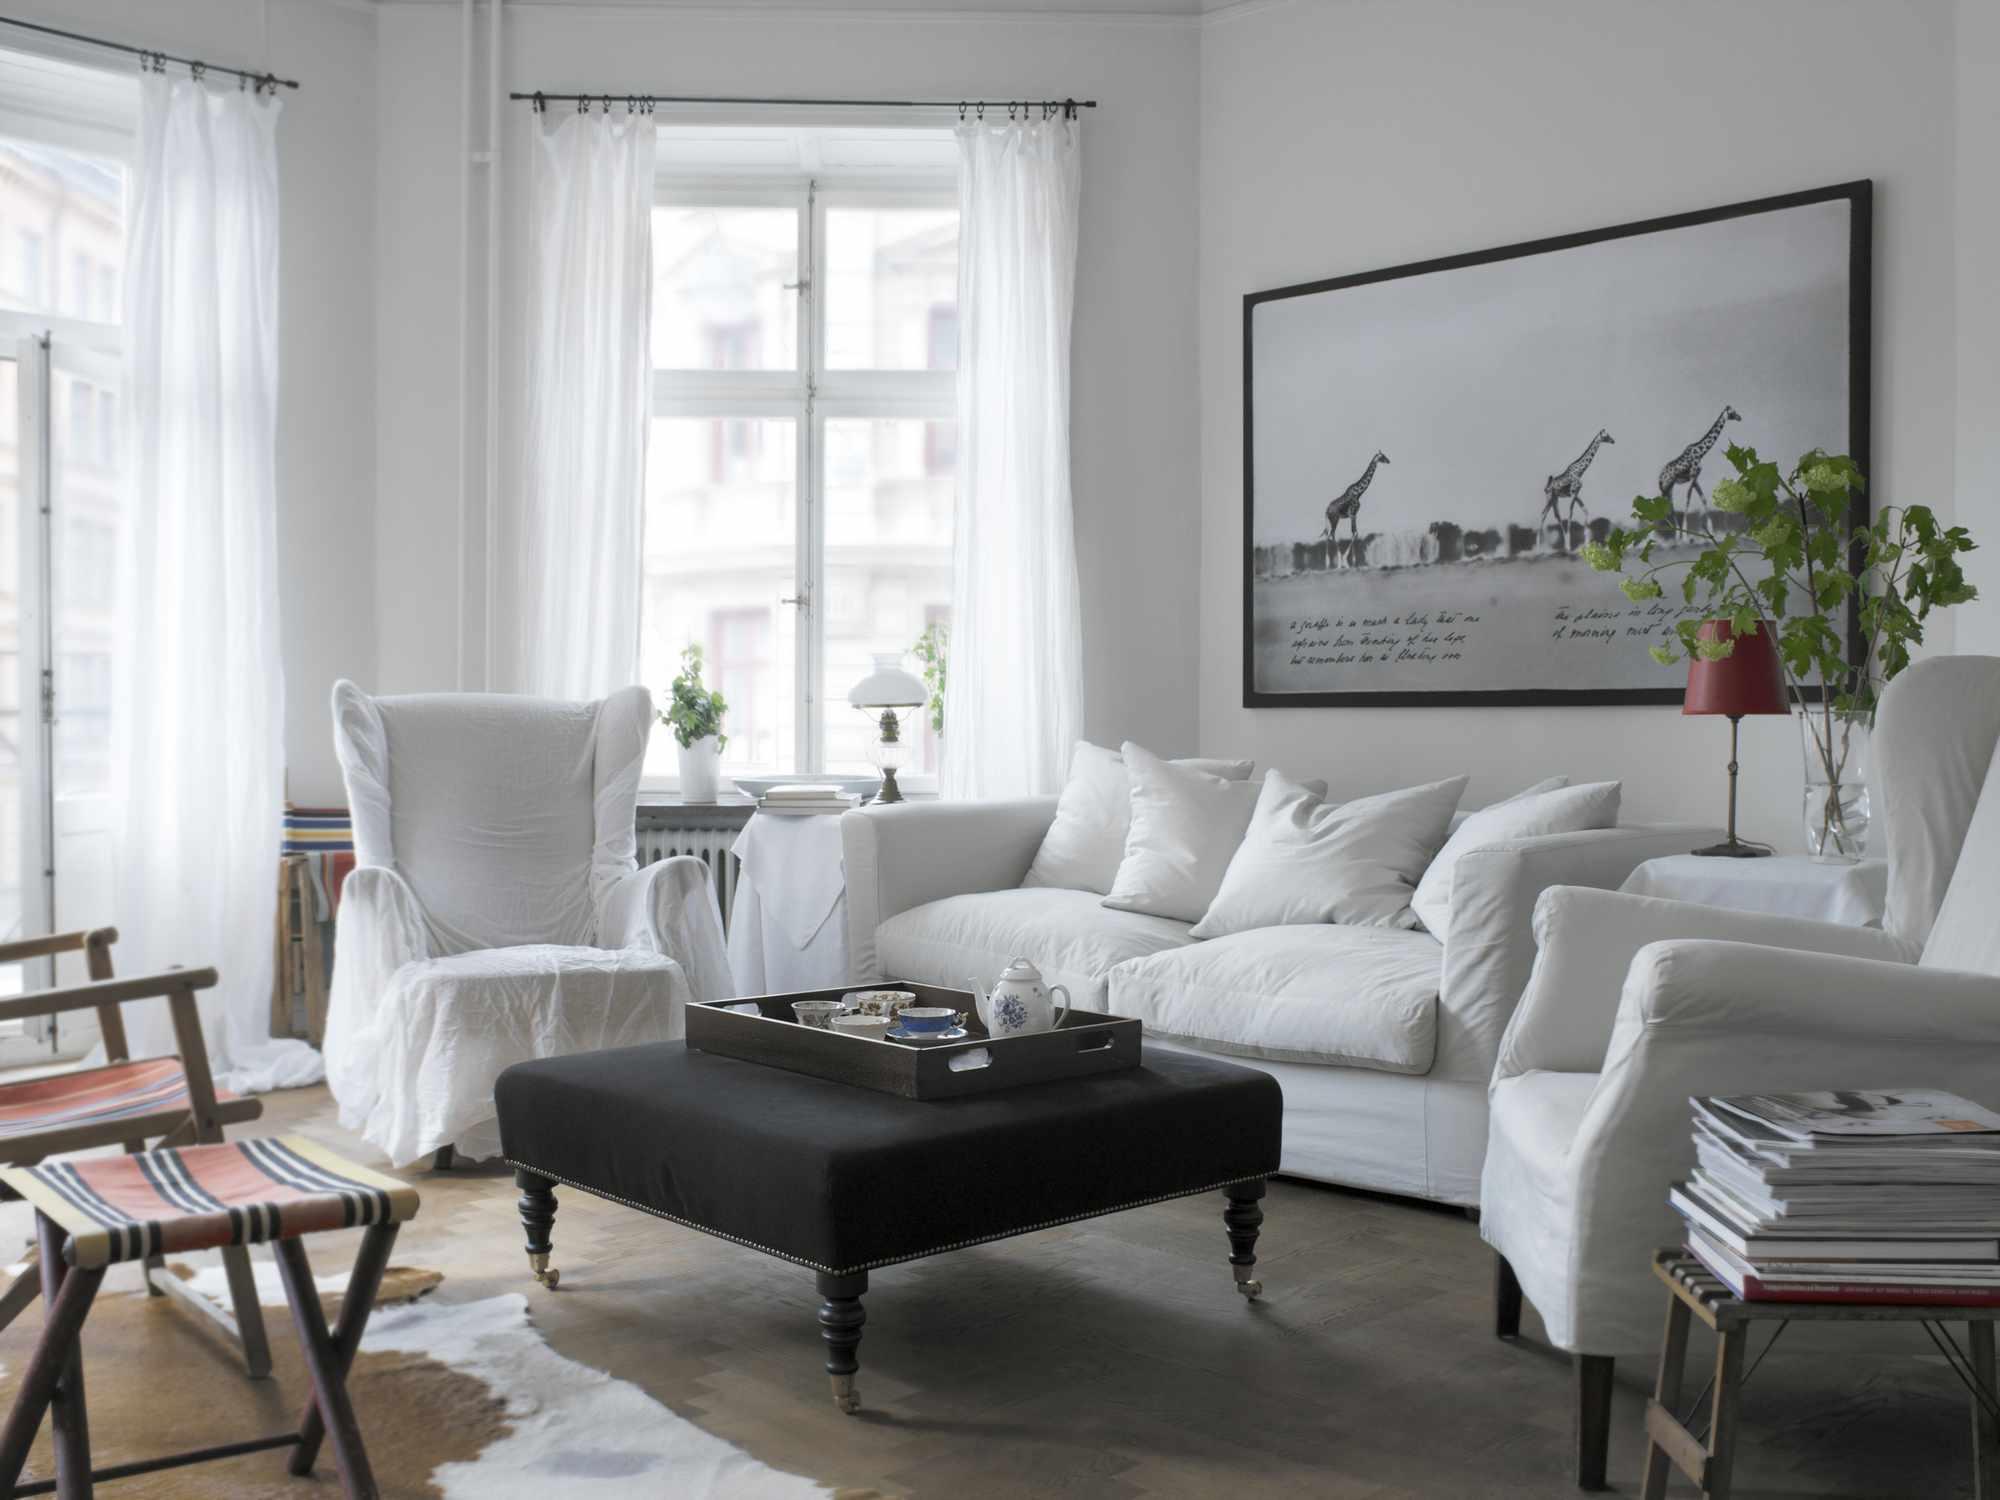 Cozy slipcovered living room furniture